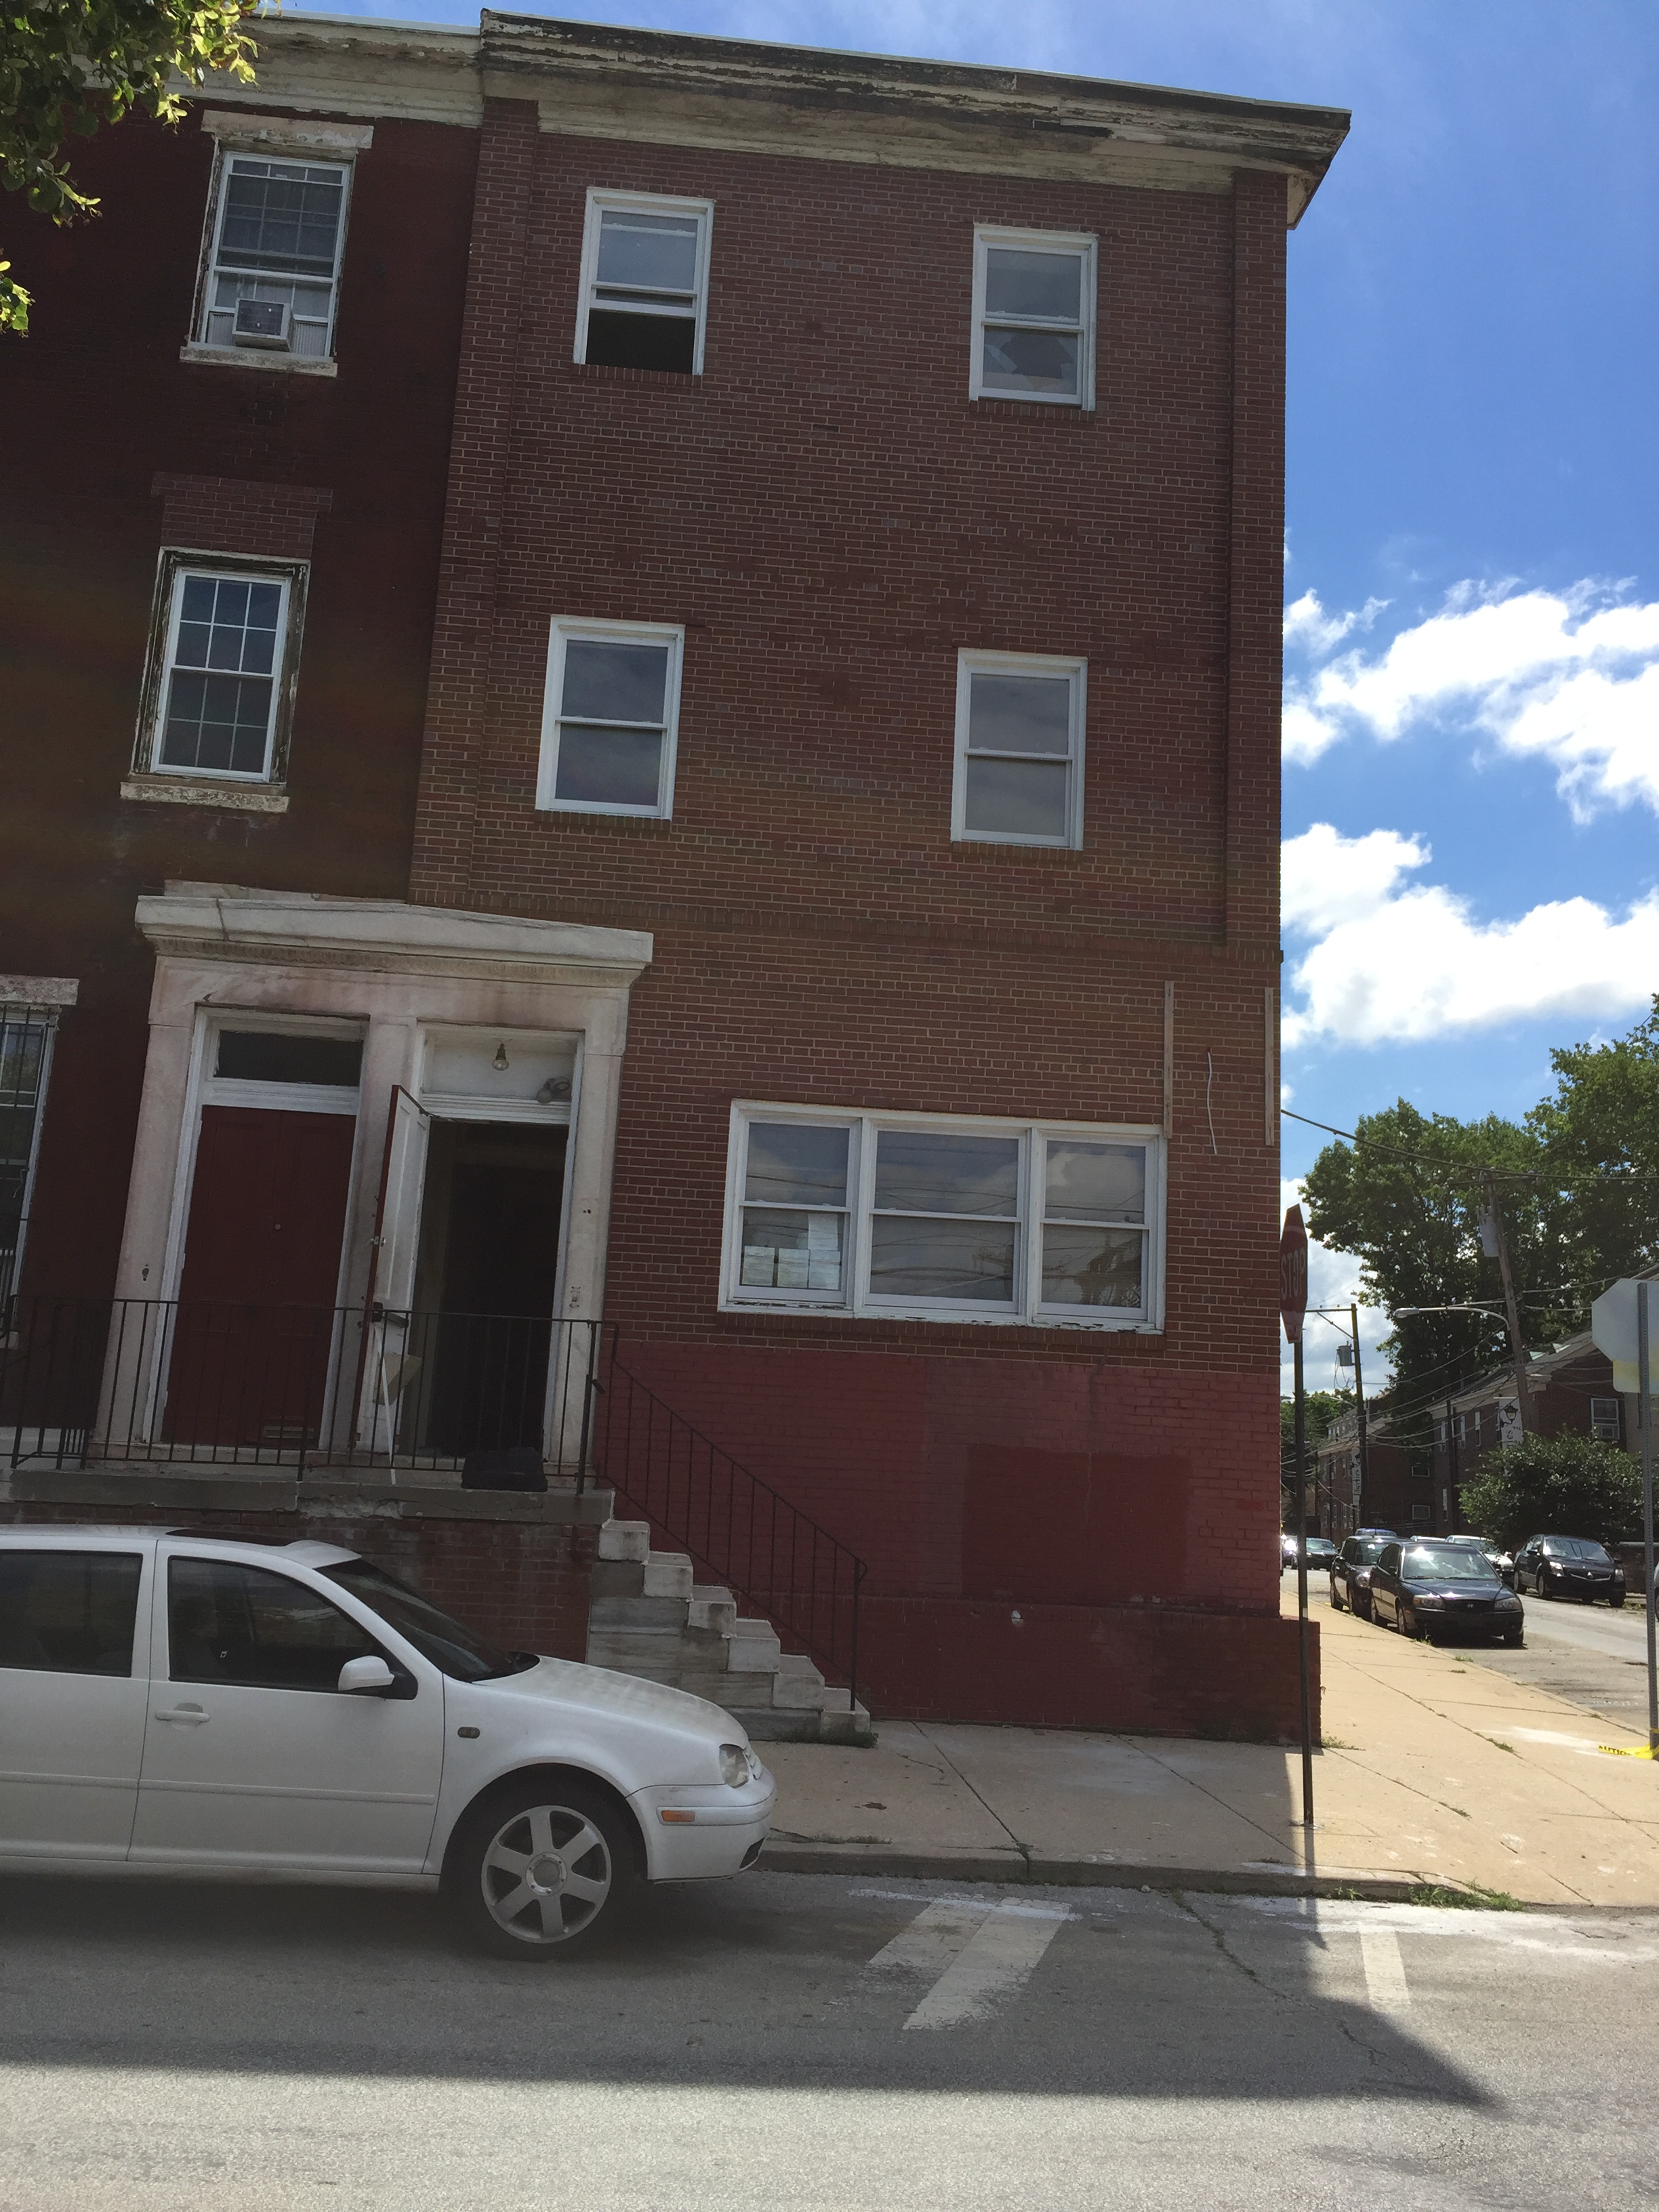 701 N 8th St. Apartments Exterior